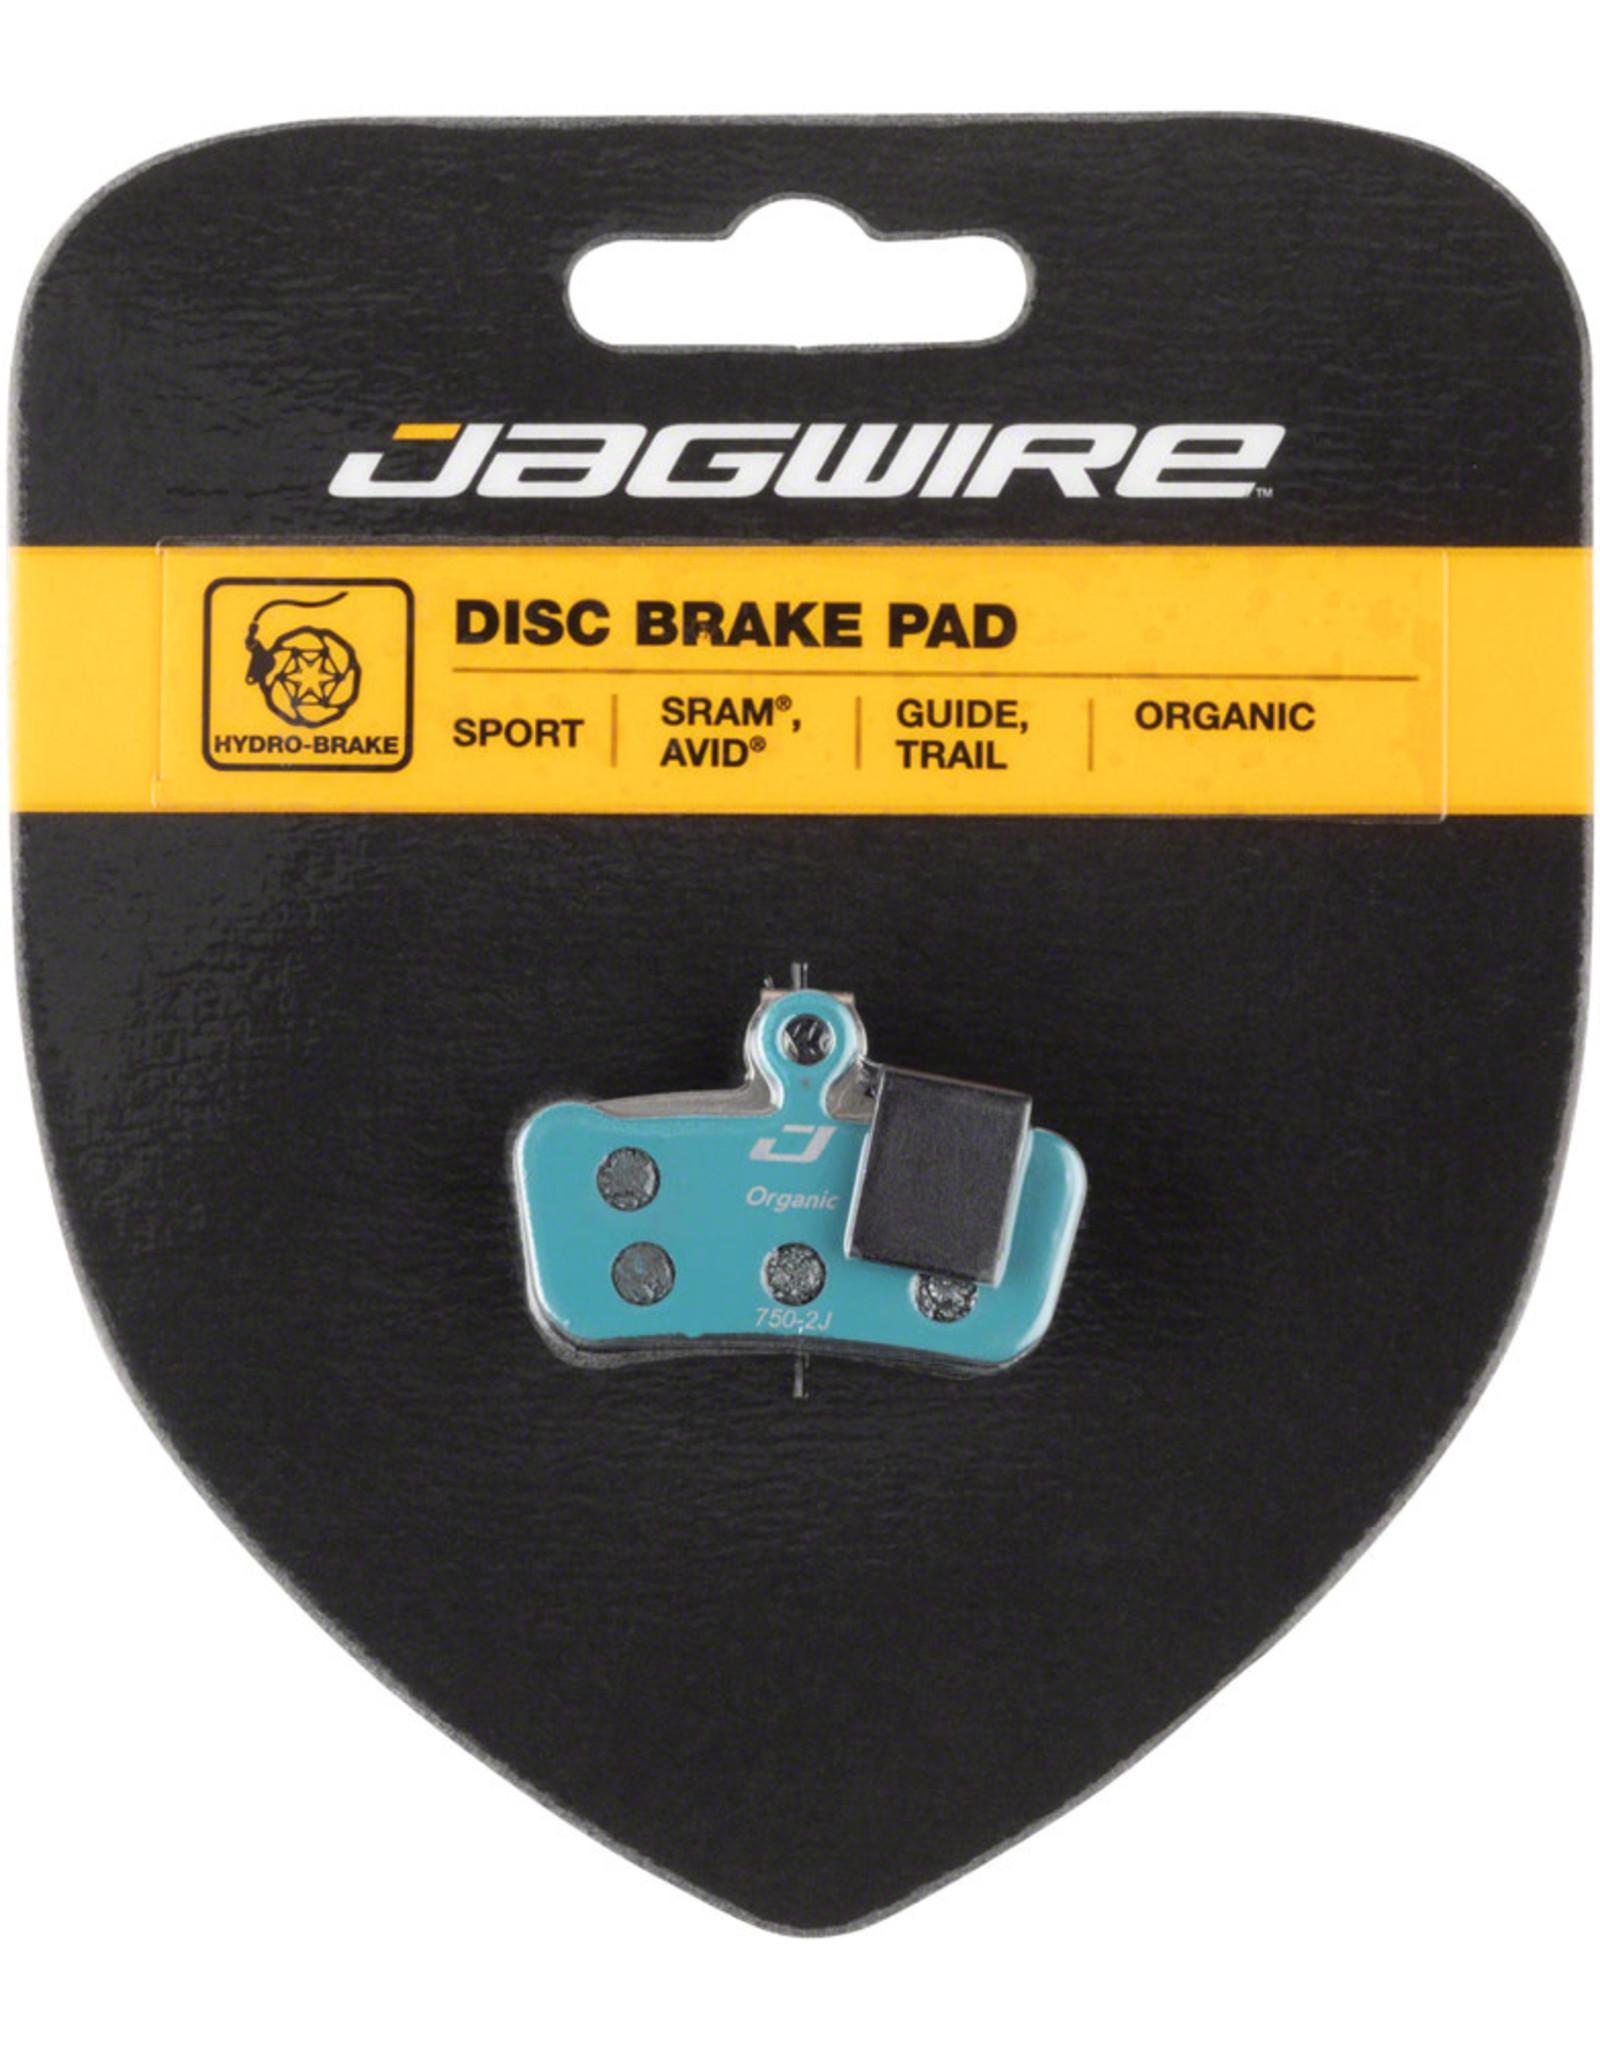 Jagwire Jagwire Sport Organic Disc Brake Pads for SRAM Guide RSC, RS, R, Avid Trail